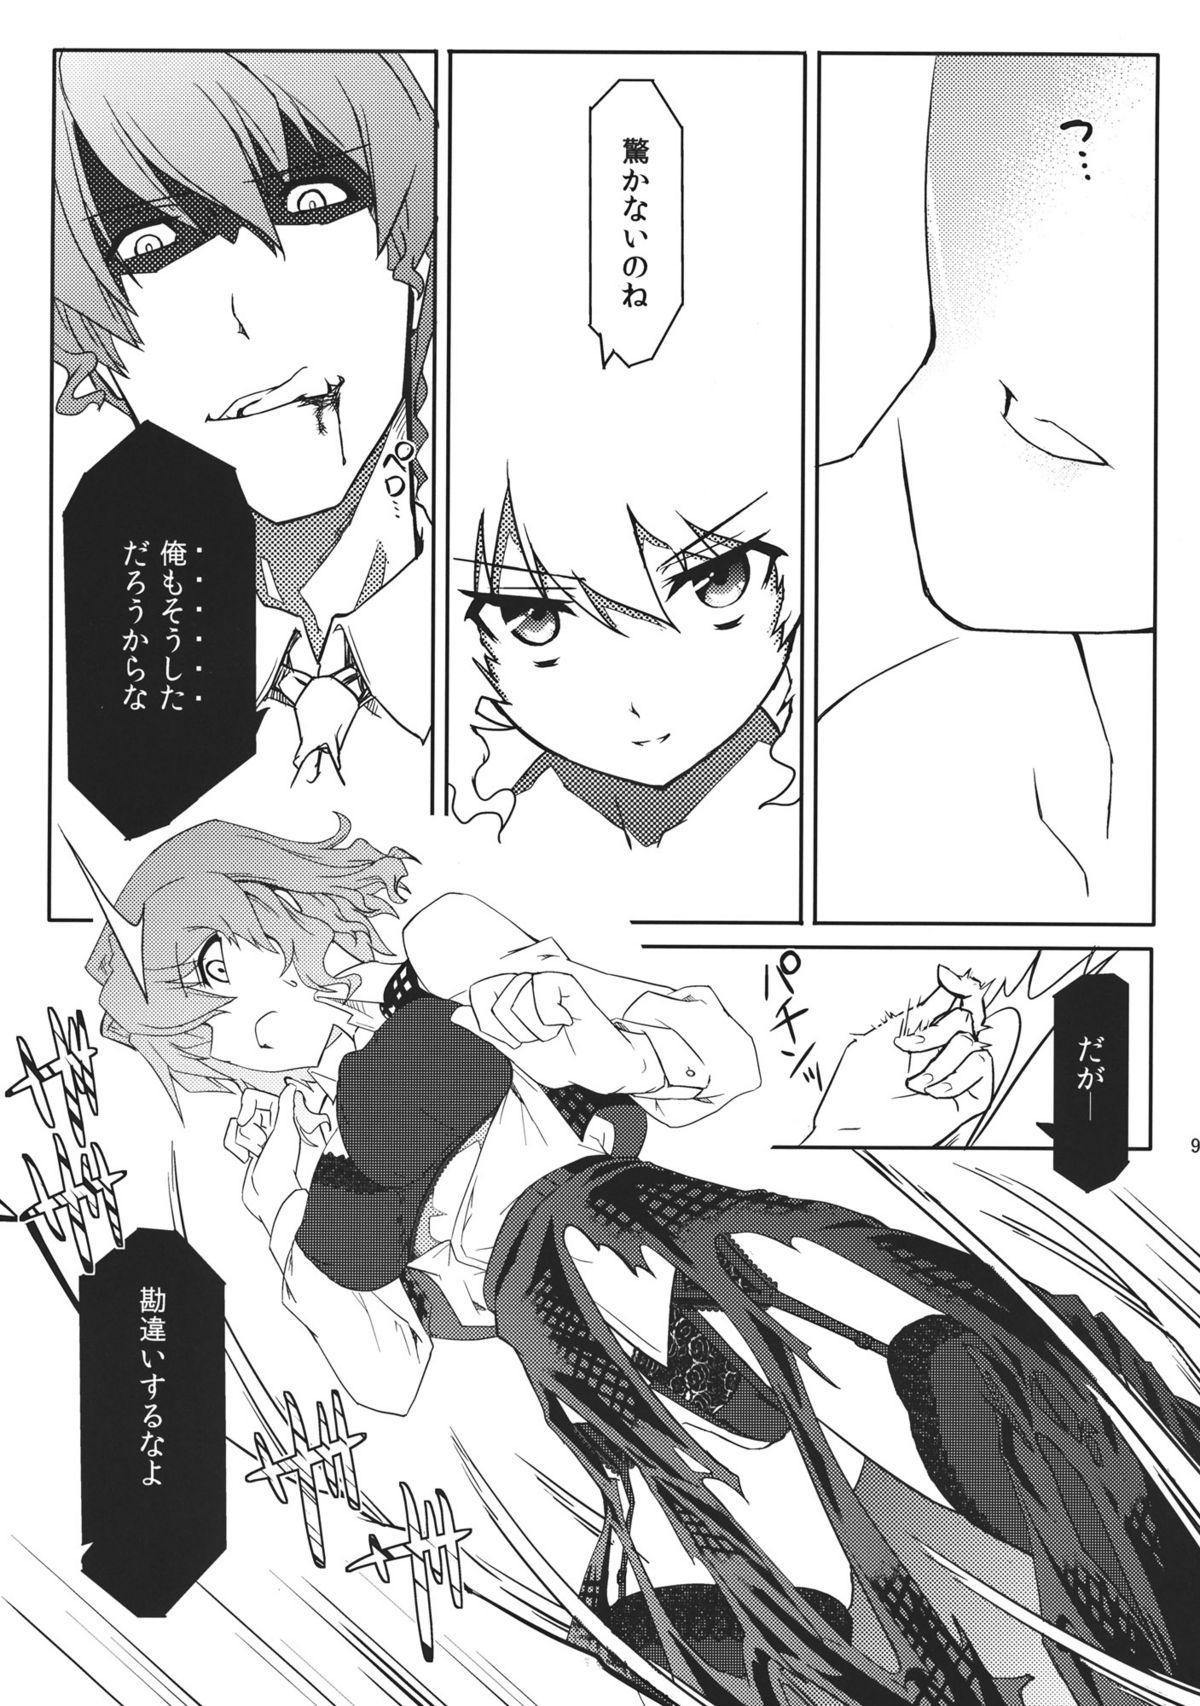 Kazami-ke Saikyou Densetsu R 10